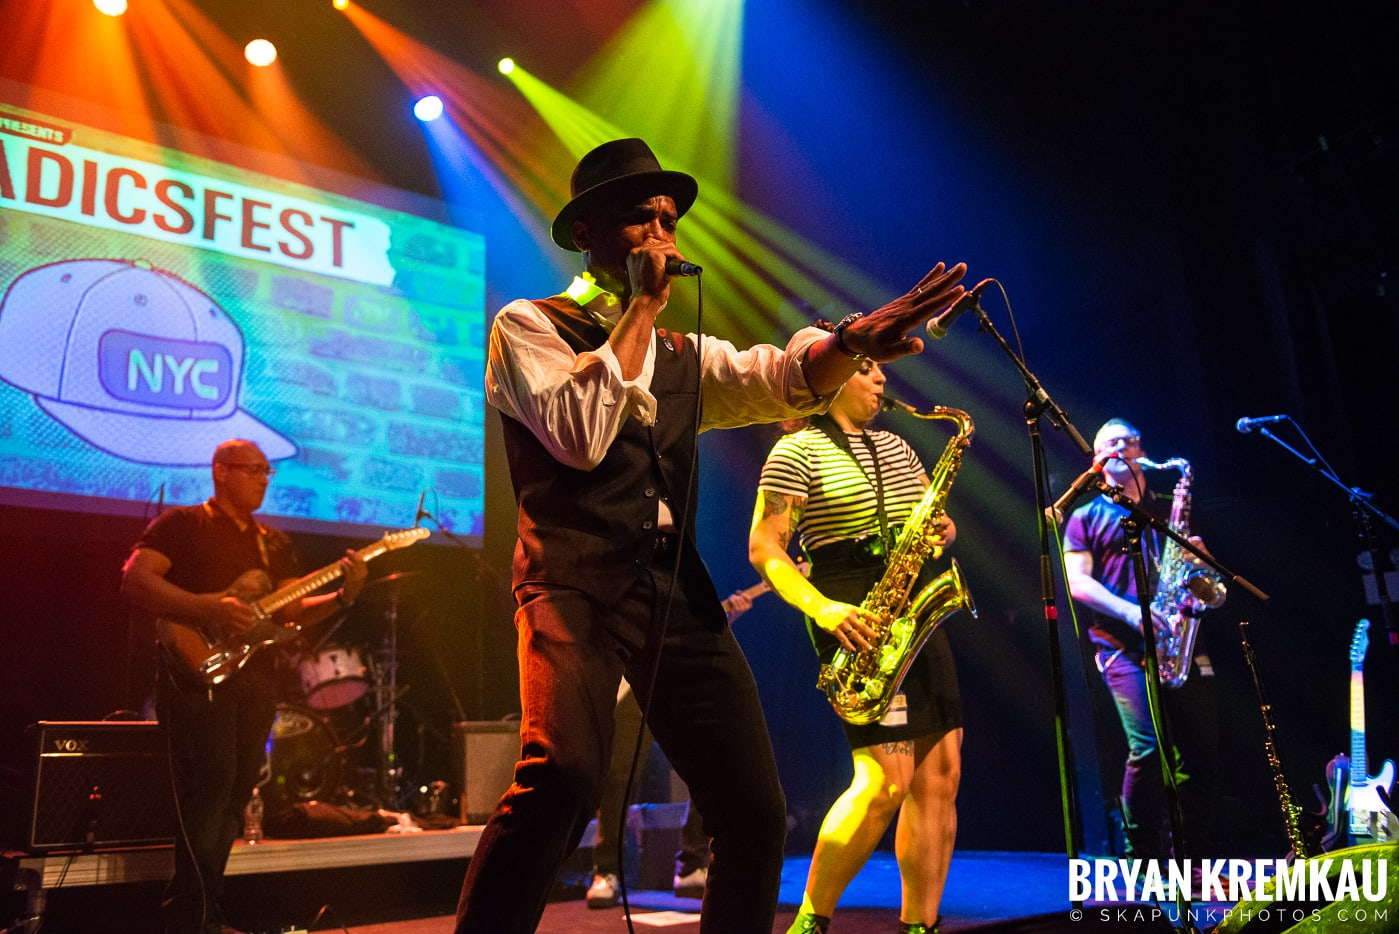 Rude Boy George @ Radicsfest, Gramercy Theatre, NYC - 7.19.19 (23)